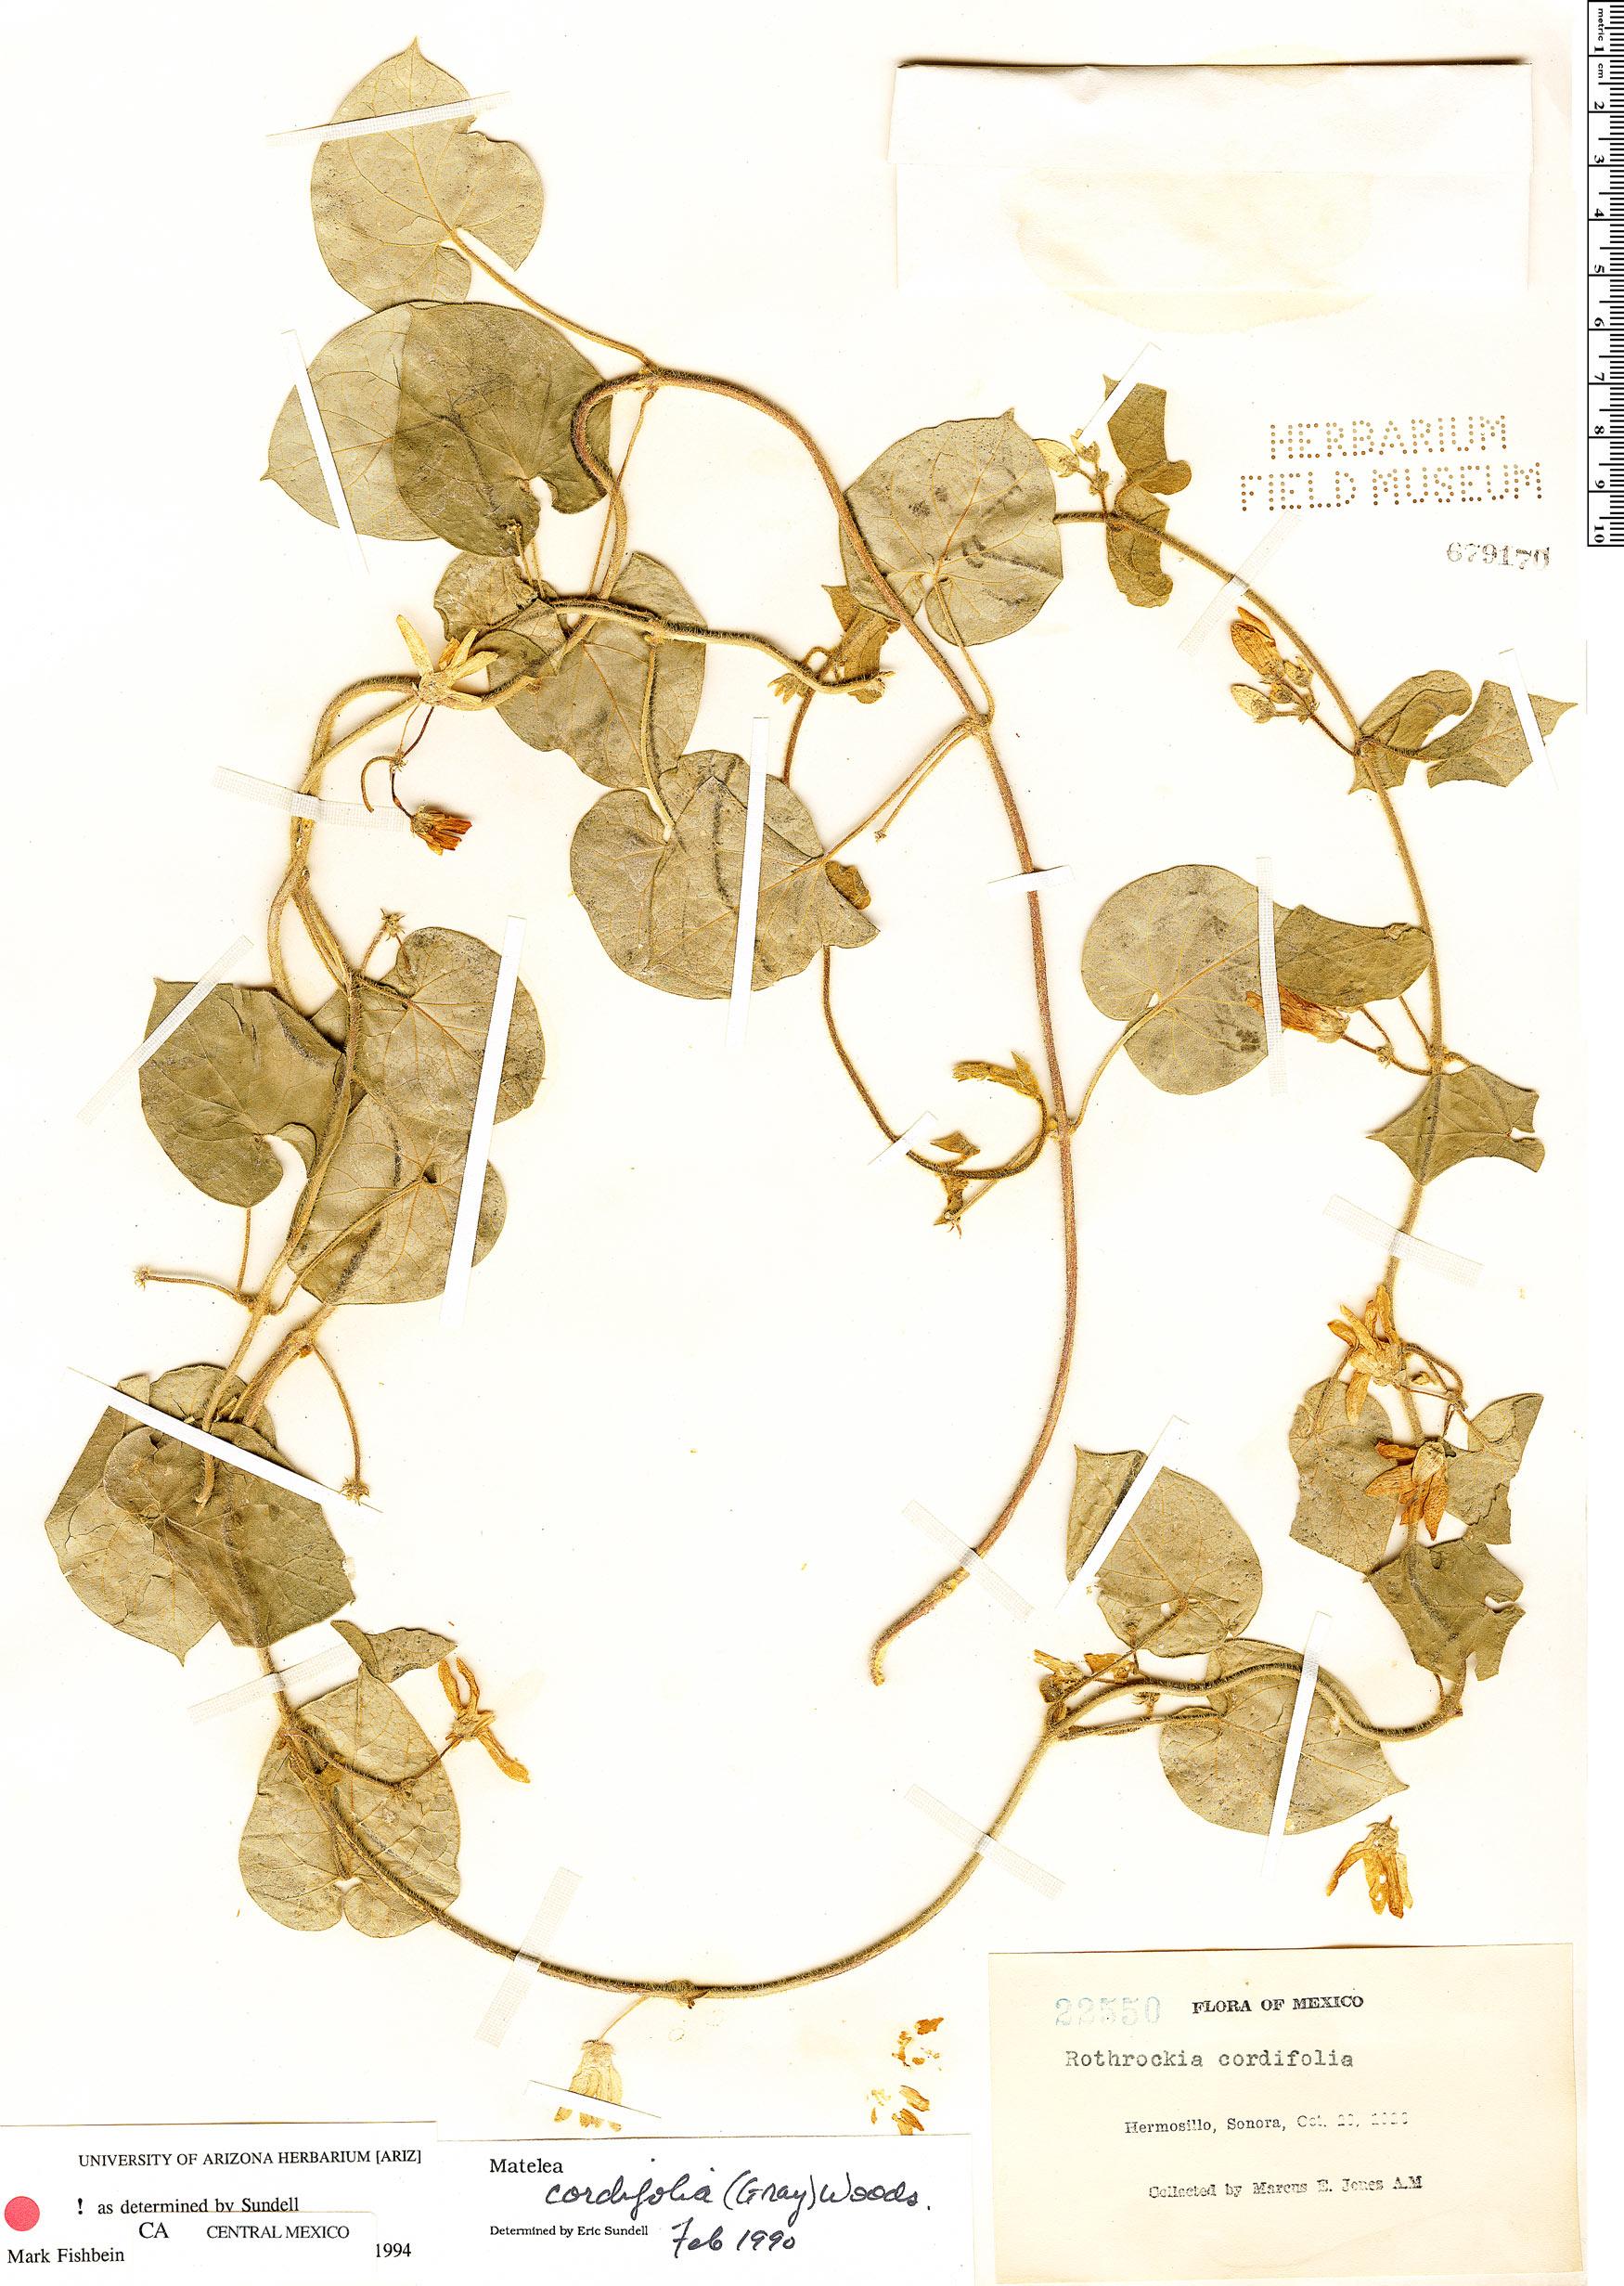 Matelea cordifolia image